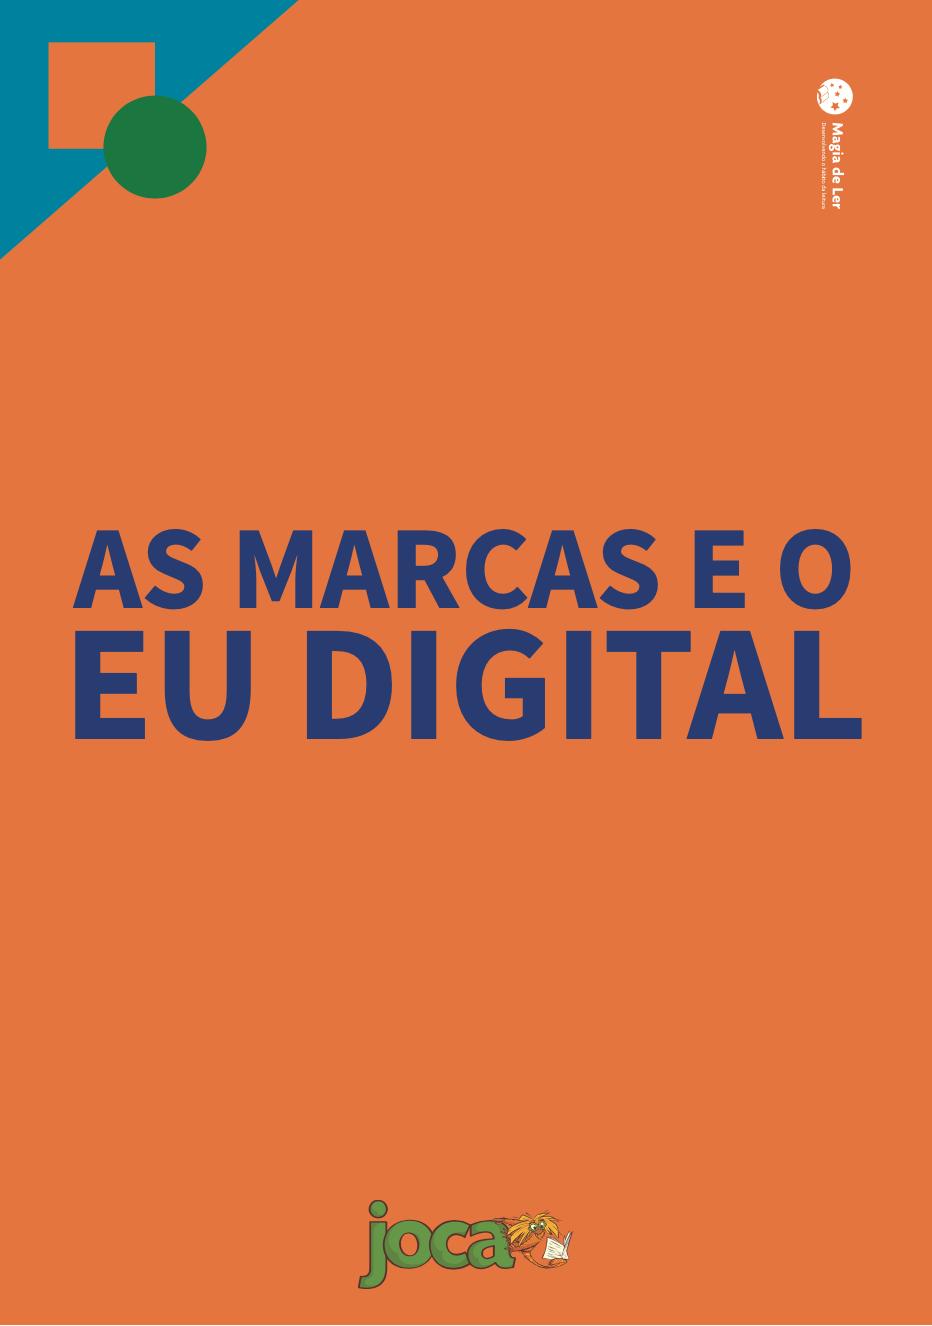 eixo publicidade, aula 3: as marcas e o eu digital